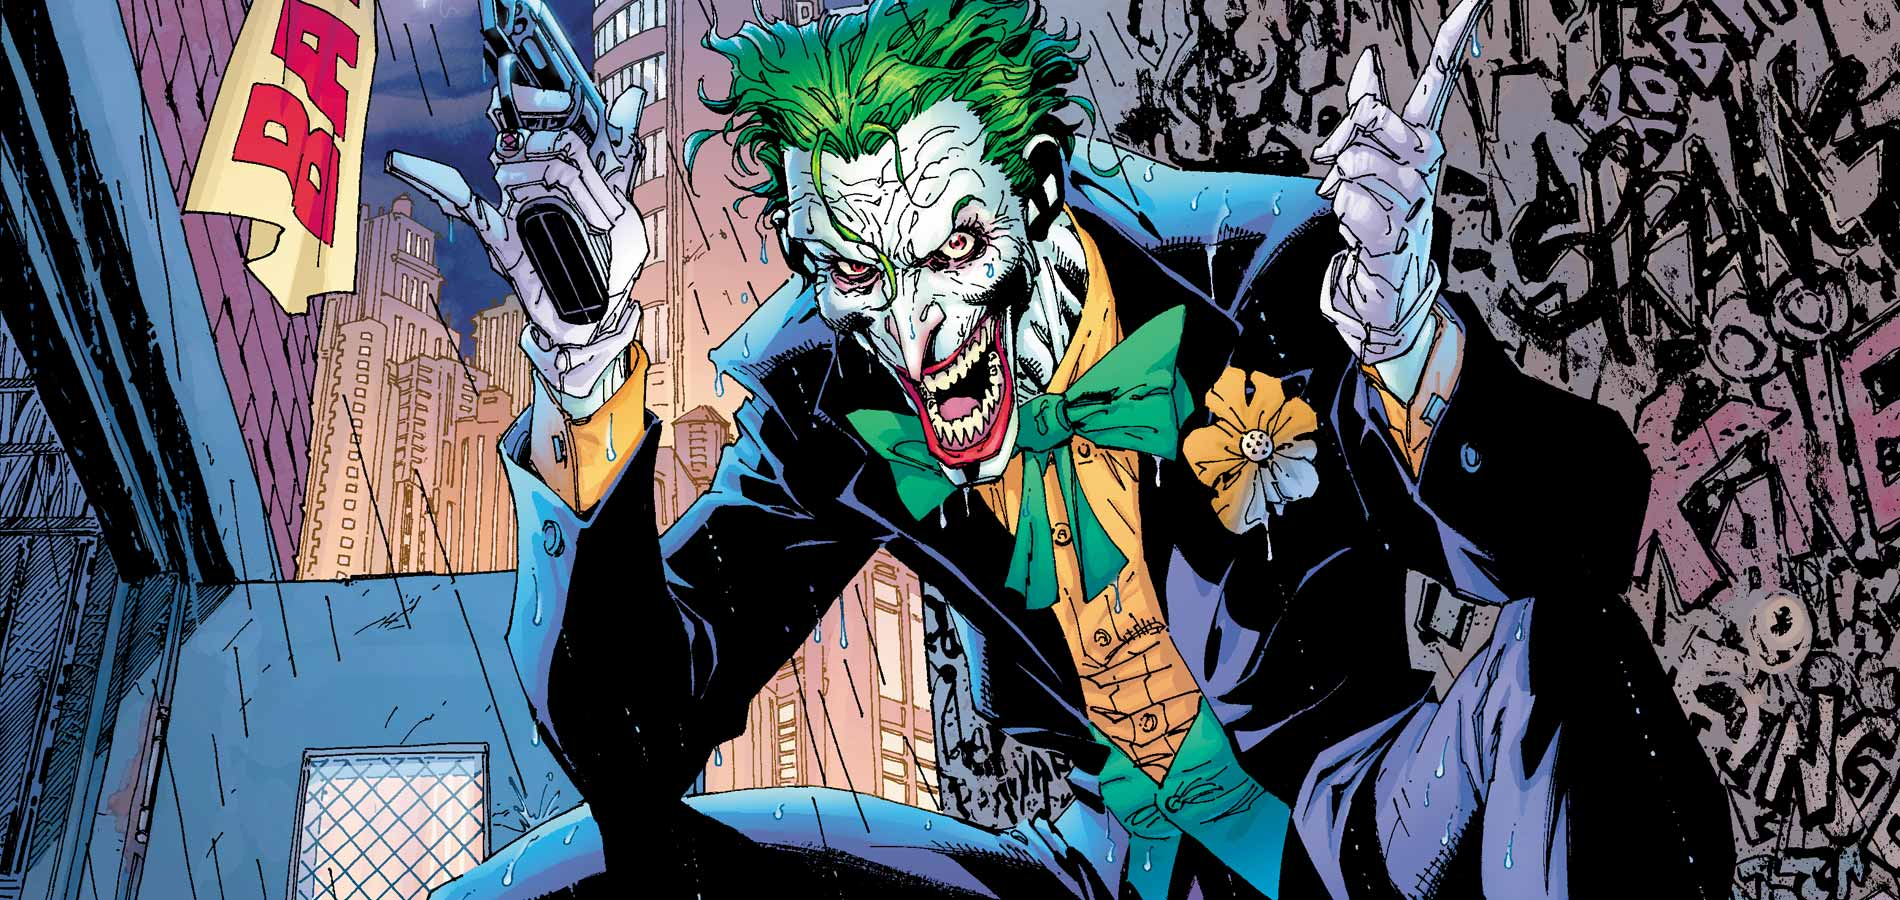 Joker Comics Wallpapers - Wallpaper Cave